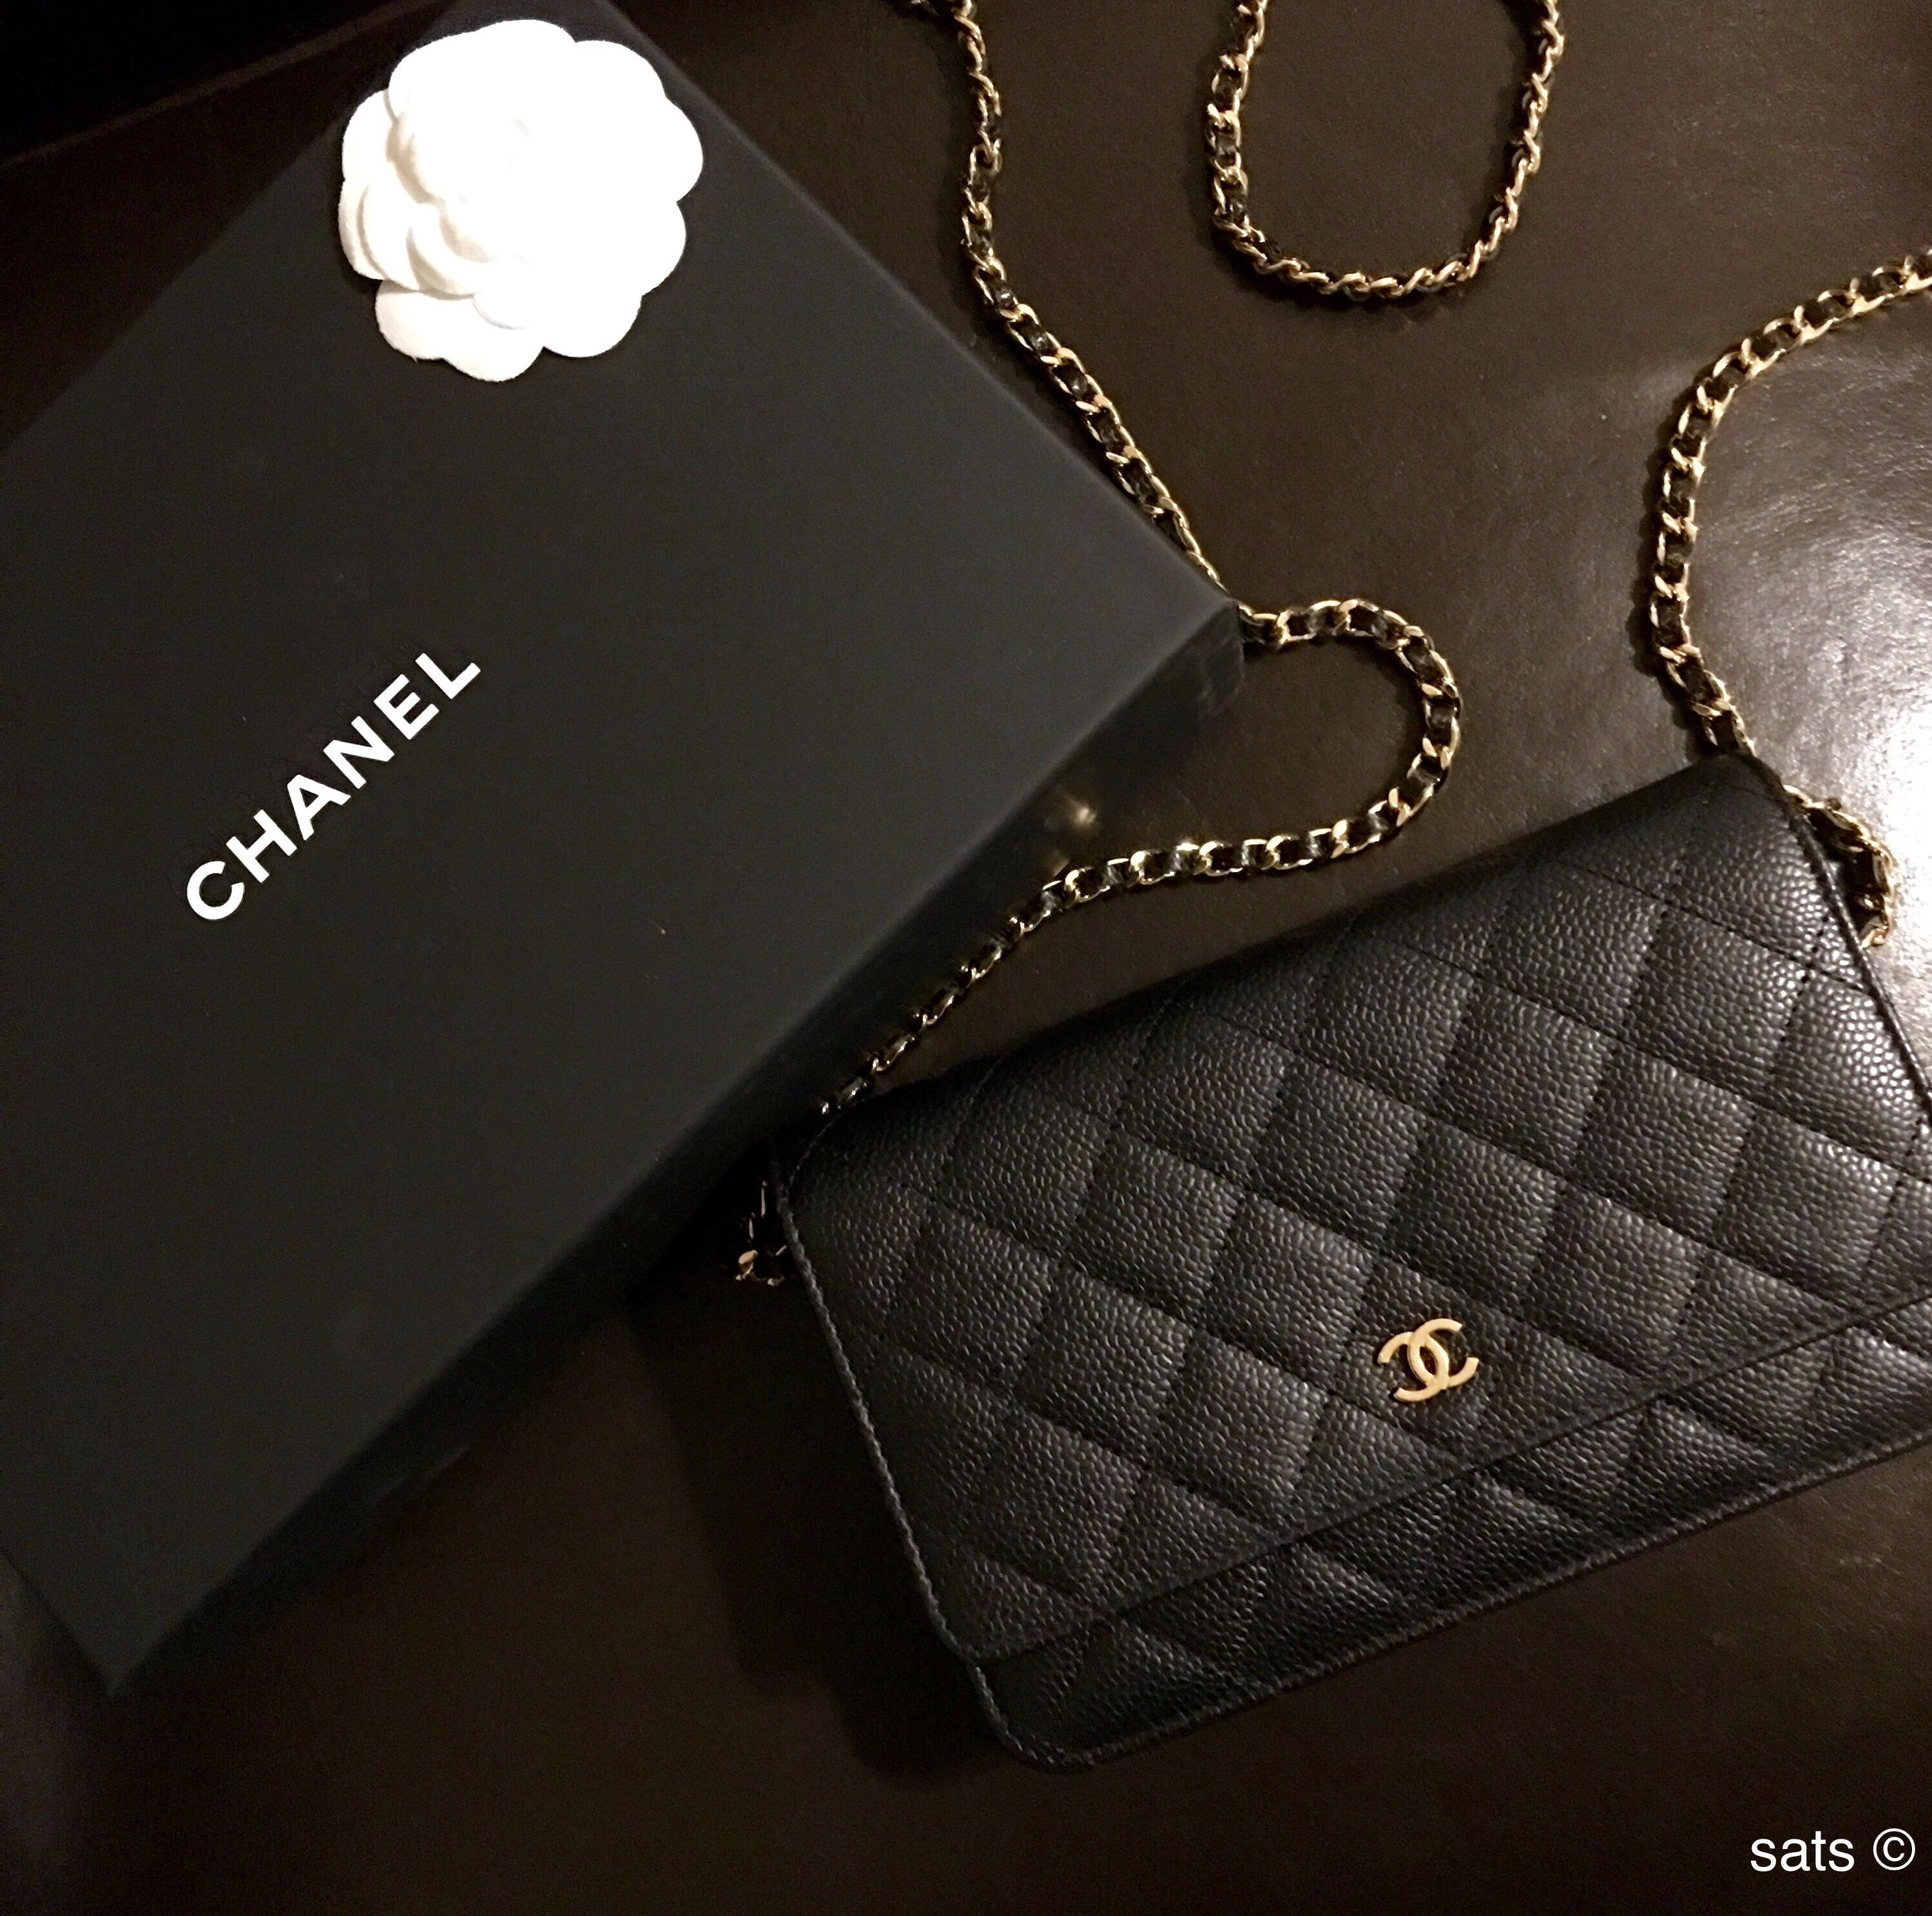 443b6289609402 Chanel black caviar woc ghw bag #timeless❤ | My Style in 2019 ...